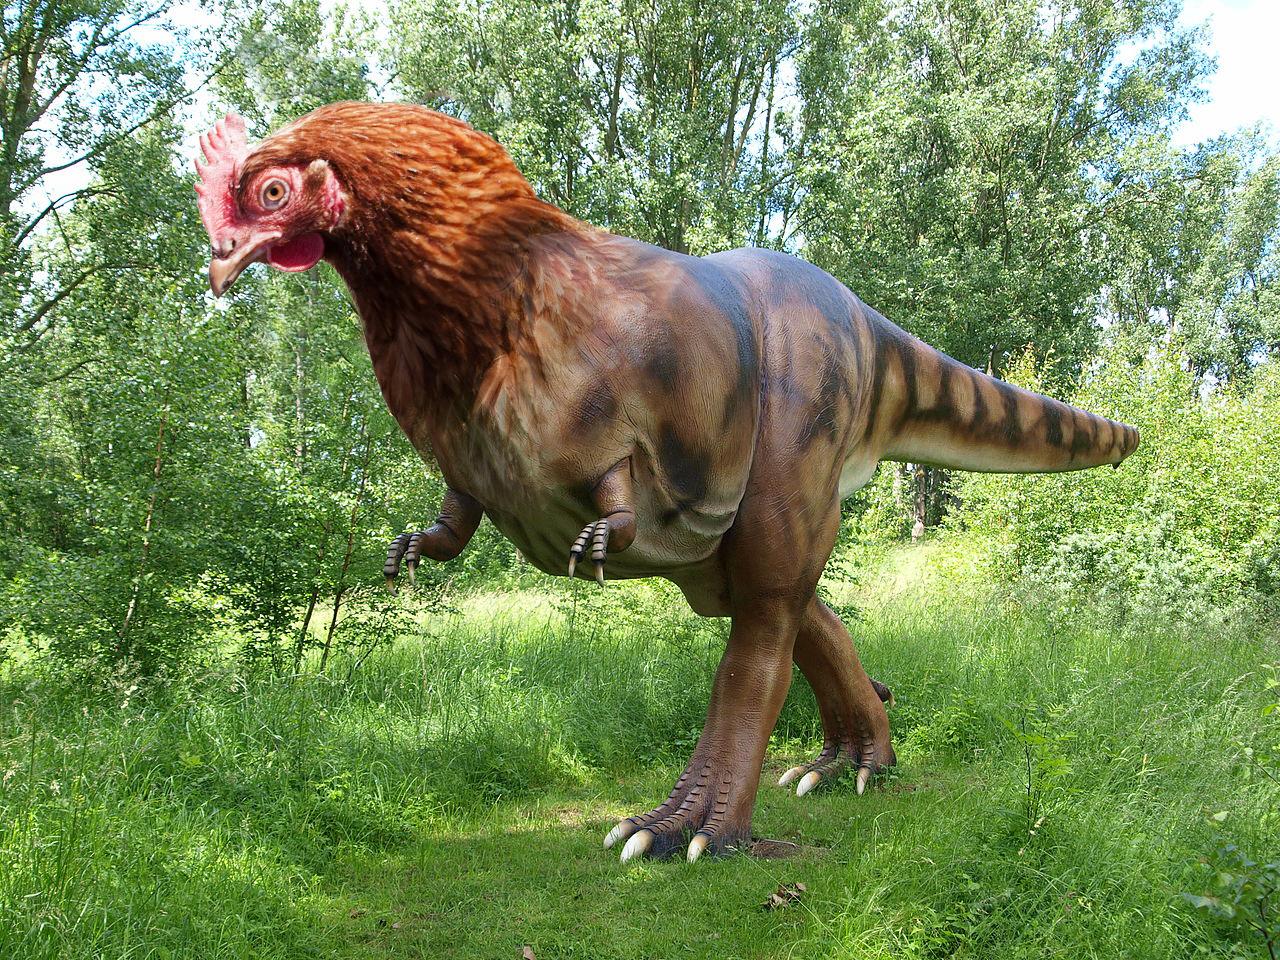 High Resolution Wallpaper   Dinosaur 1280x960 px